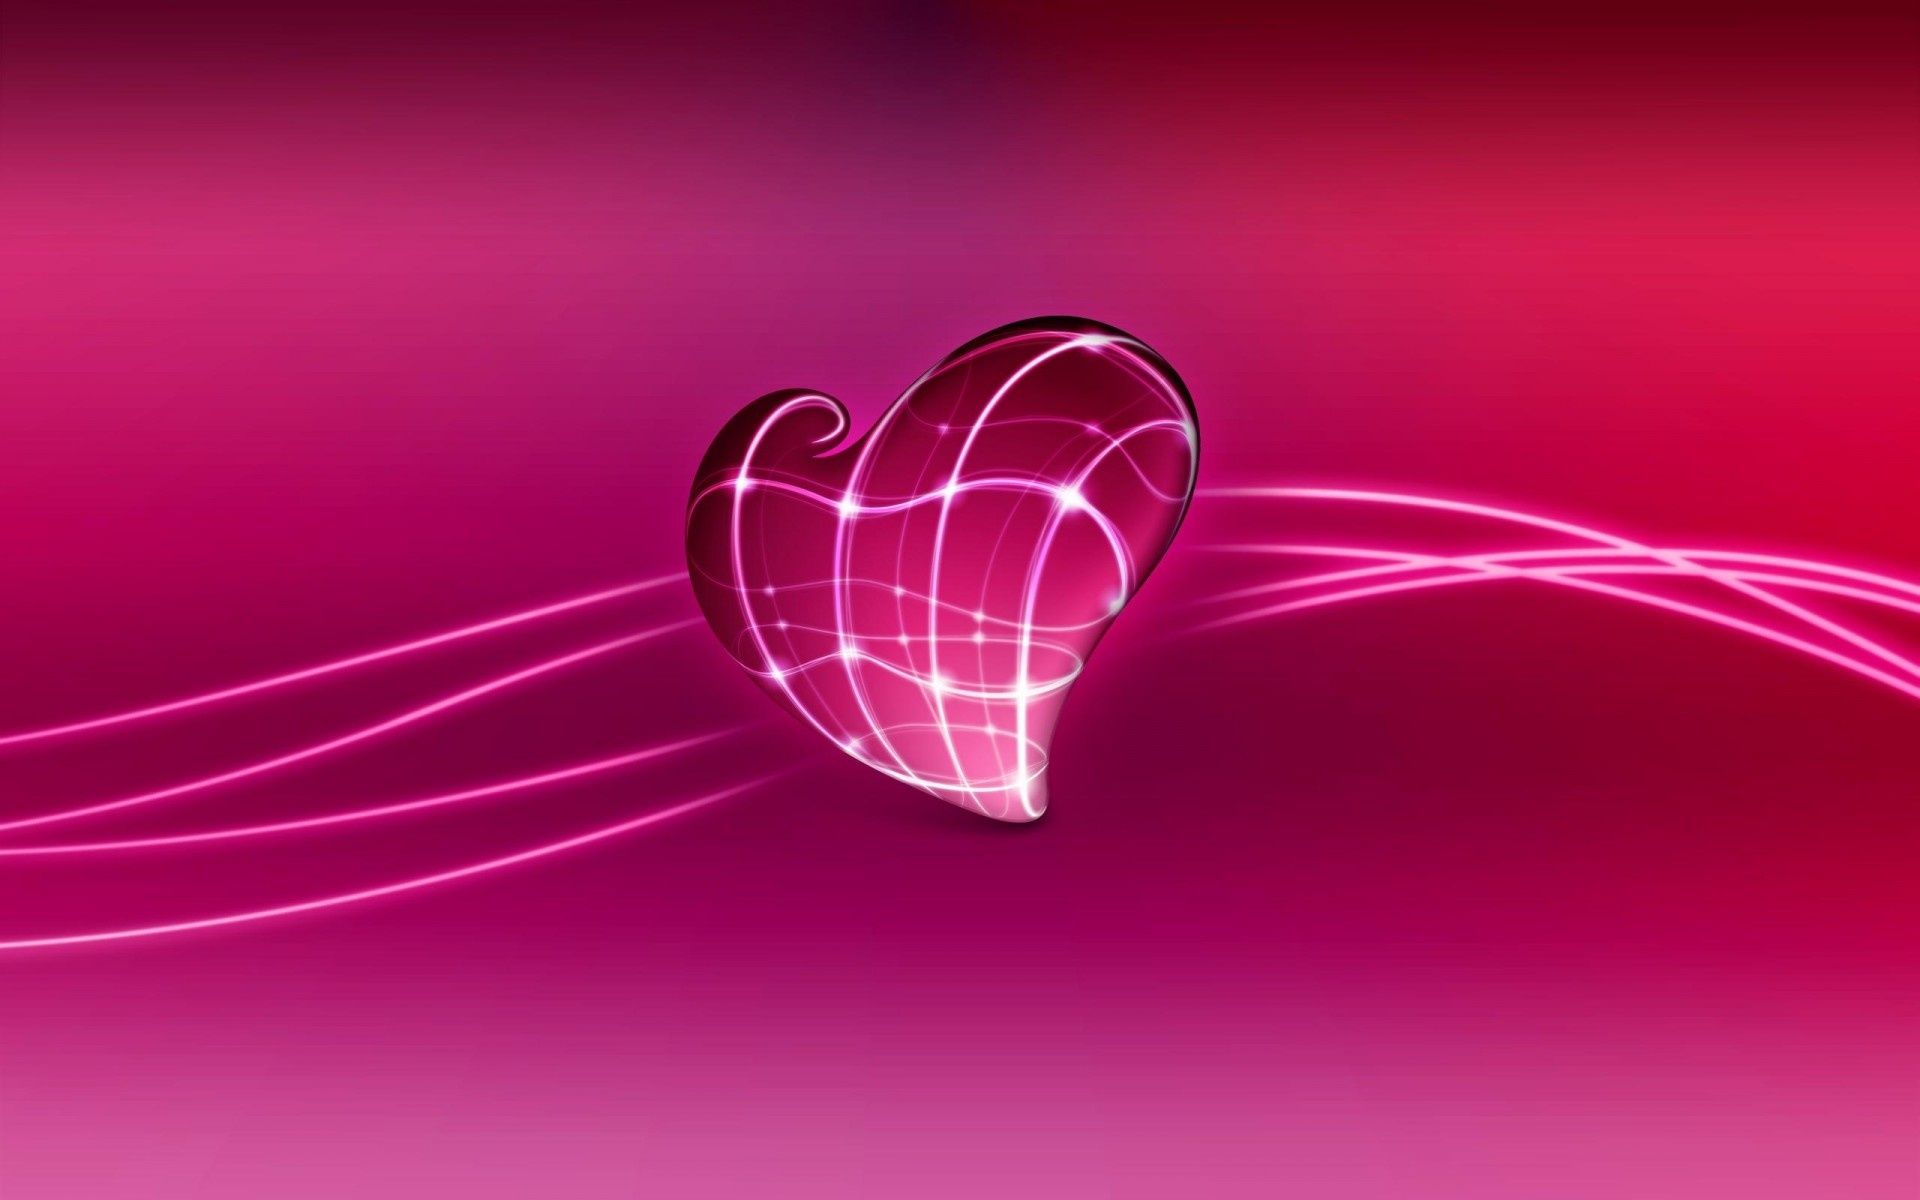 3d Love In 1920x1200 Resolution Hd Desktop Wallpapers Heart Wallpaper Heart Wallpaper Hd Love Pink Wallpaper